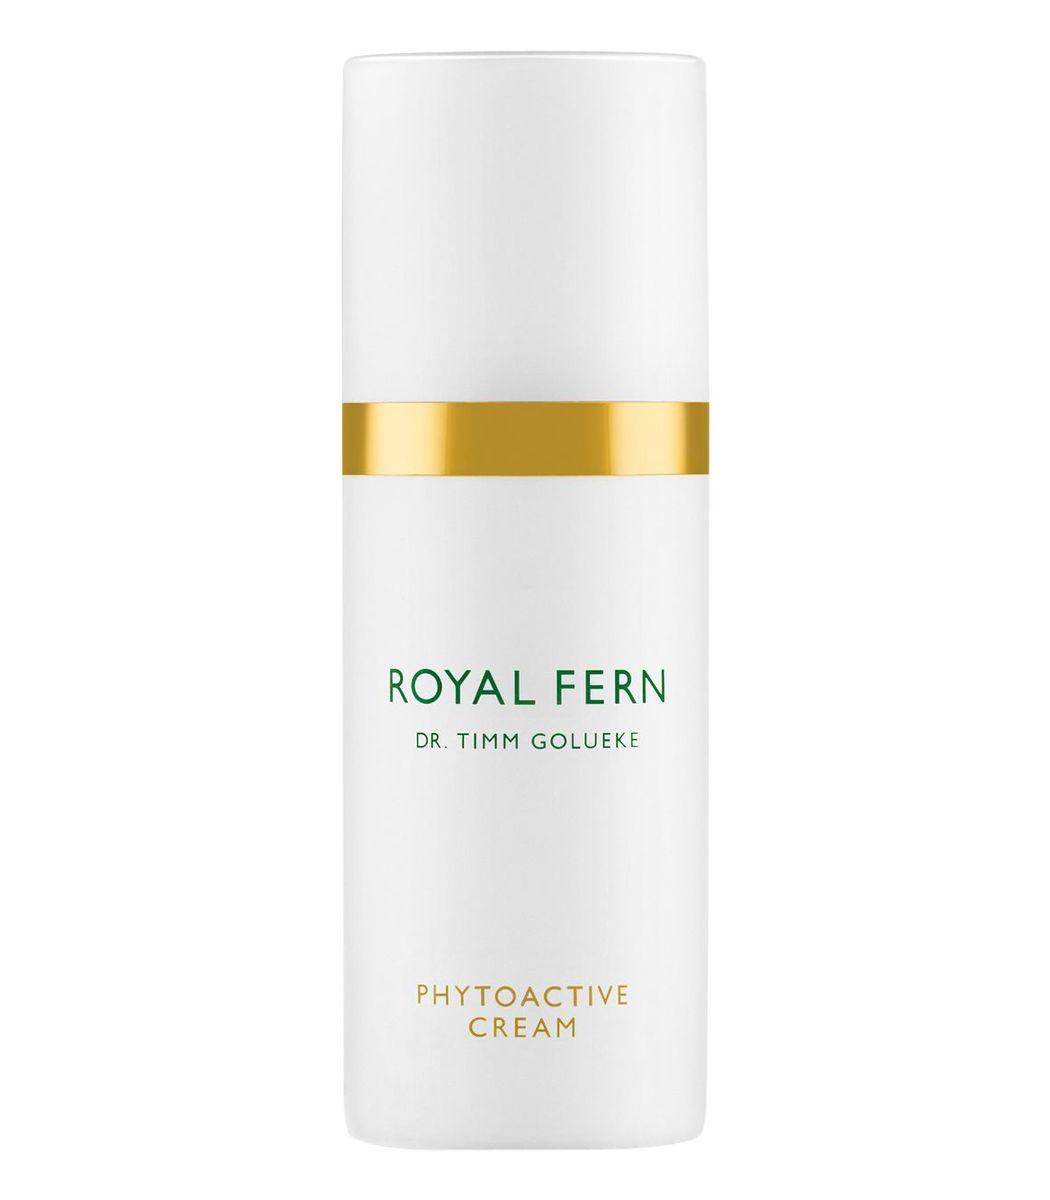 Royal Fern Phytoactive Cream, 30ml In White